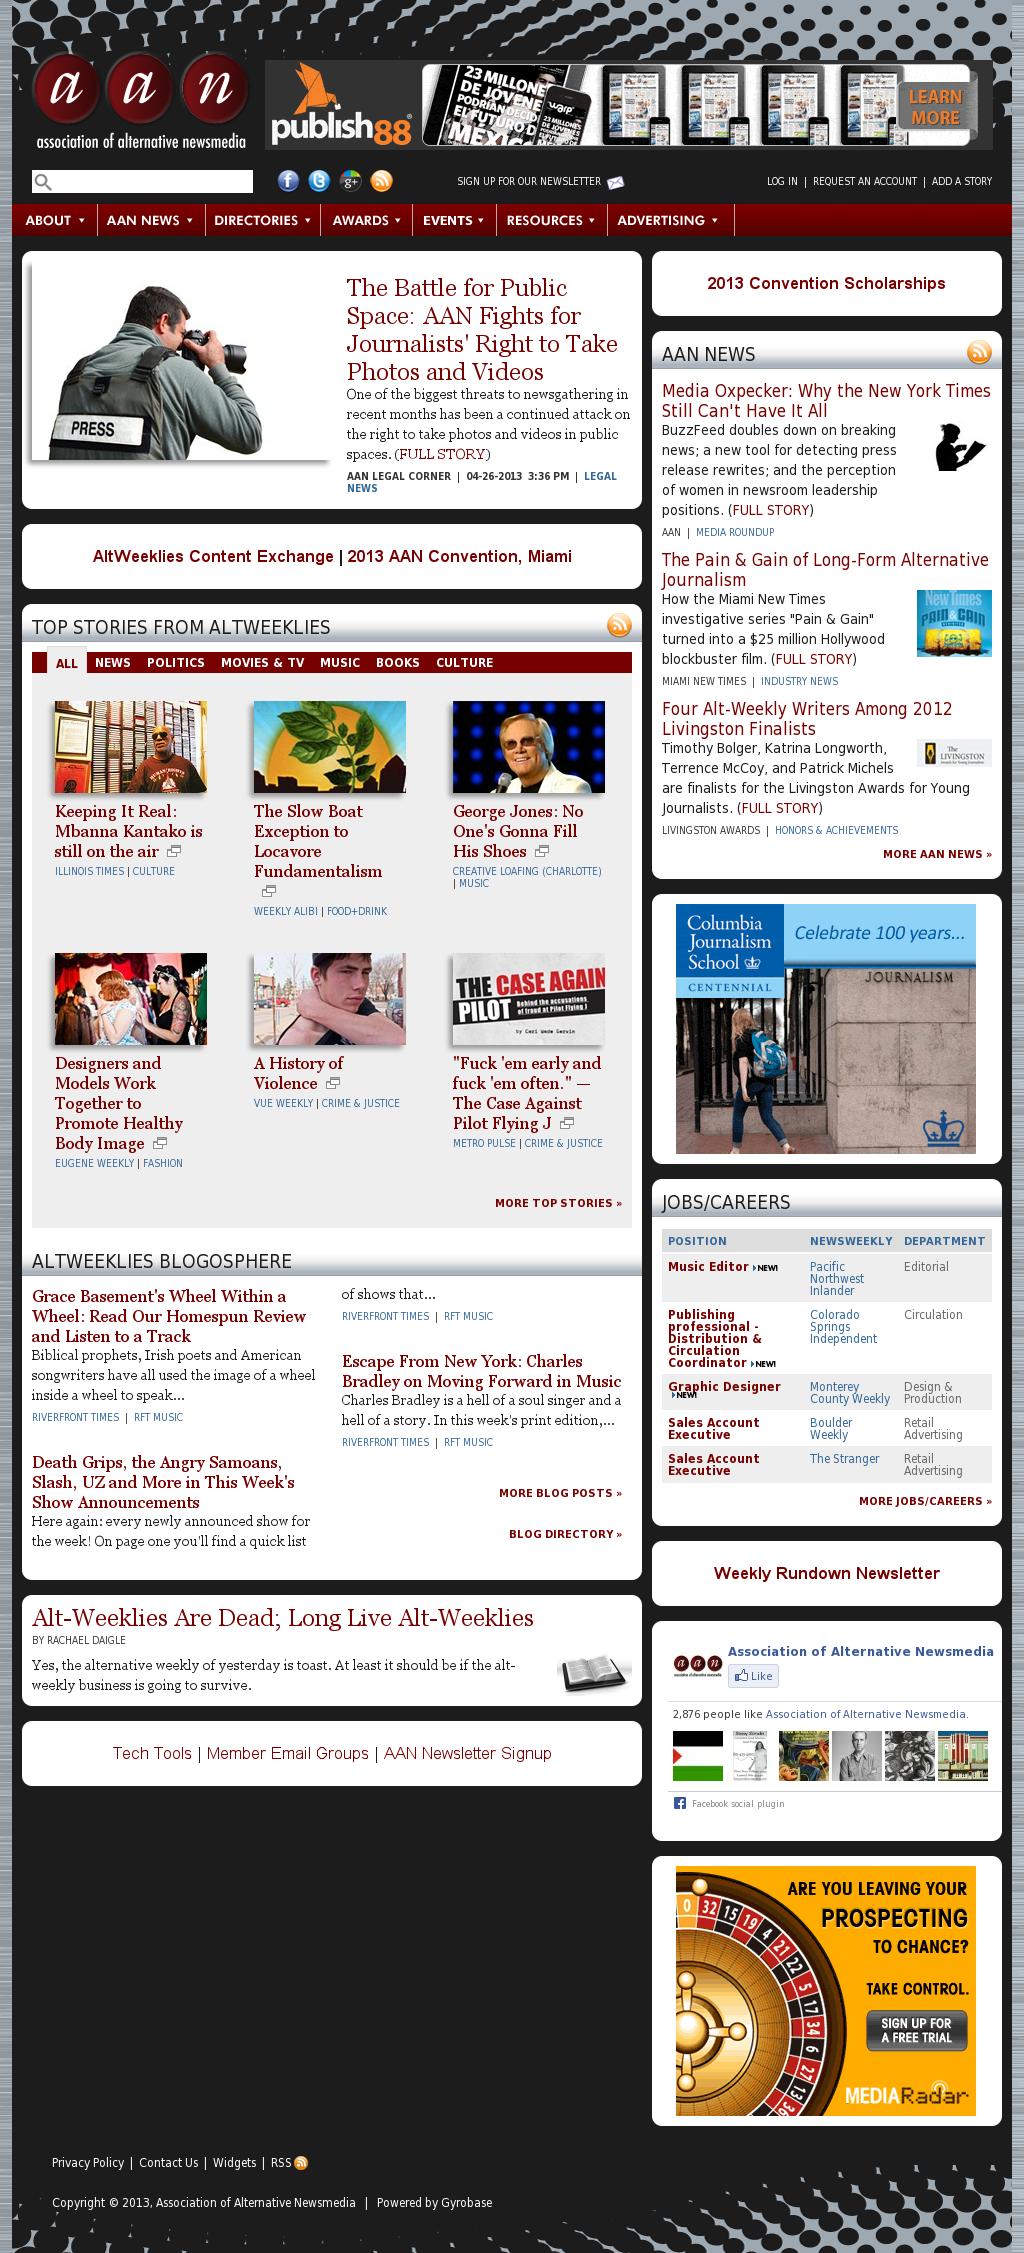 Association of Alternative Newsmedia at Wednesday May 1, 2013, noon UTC